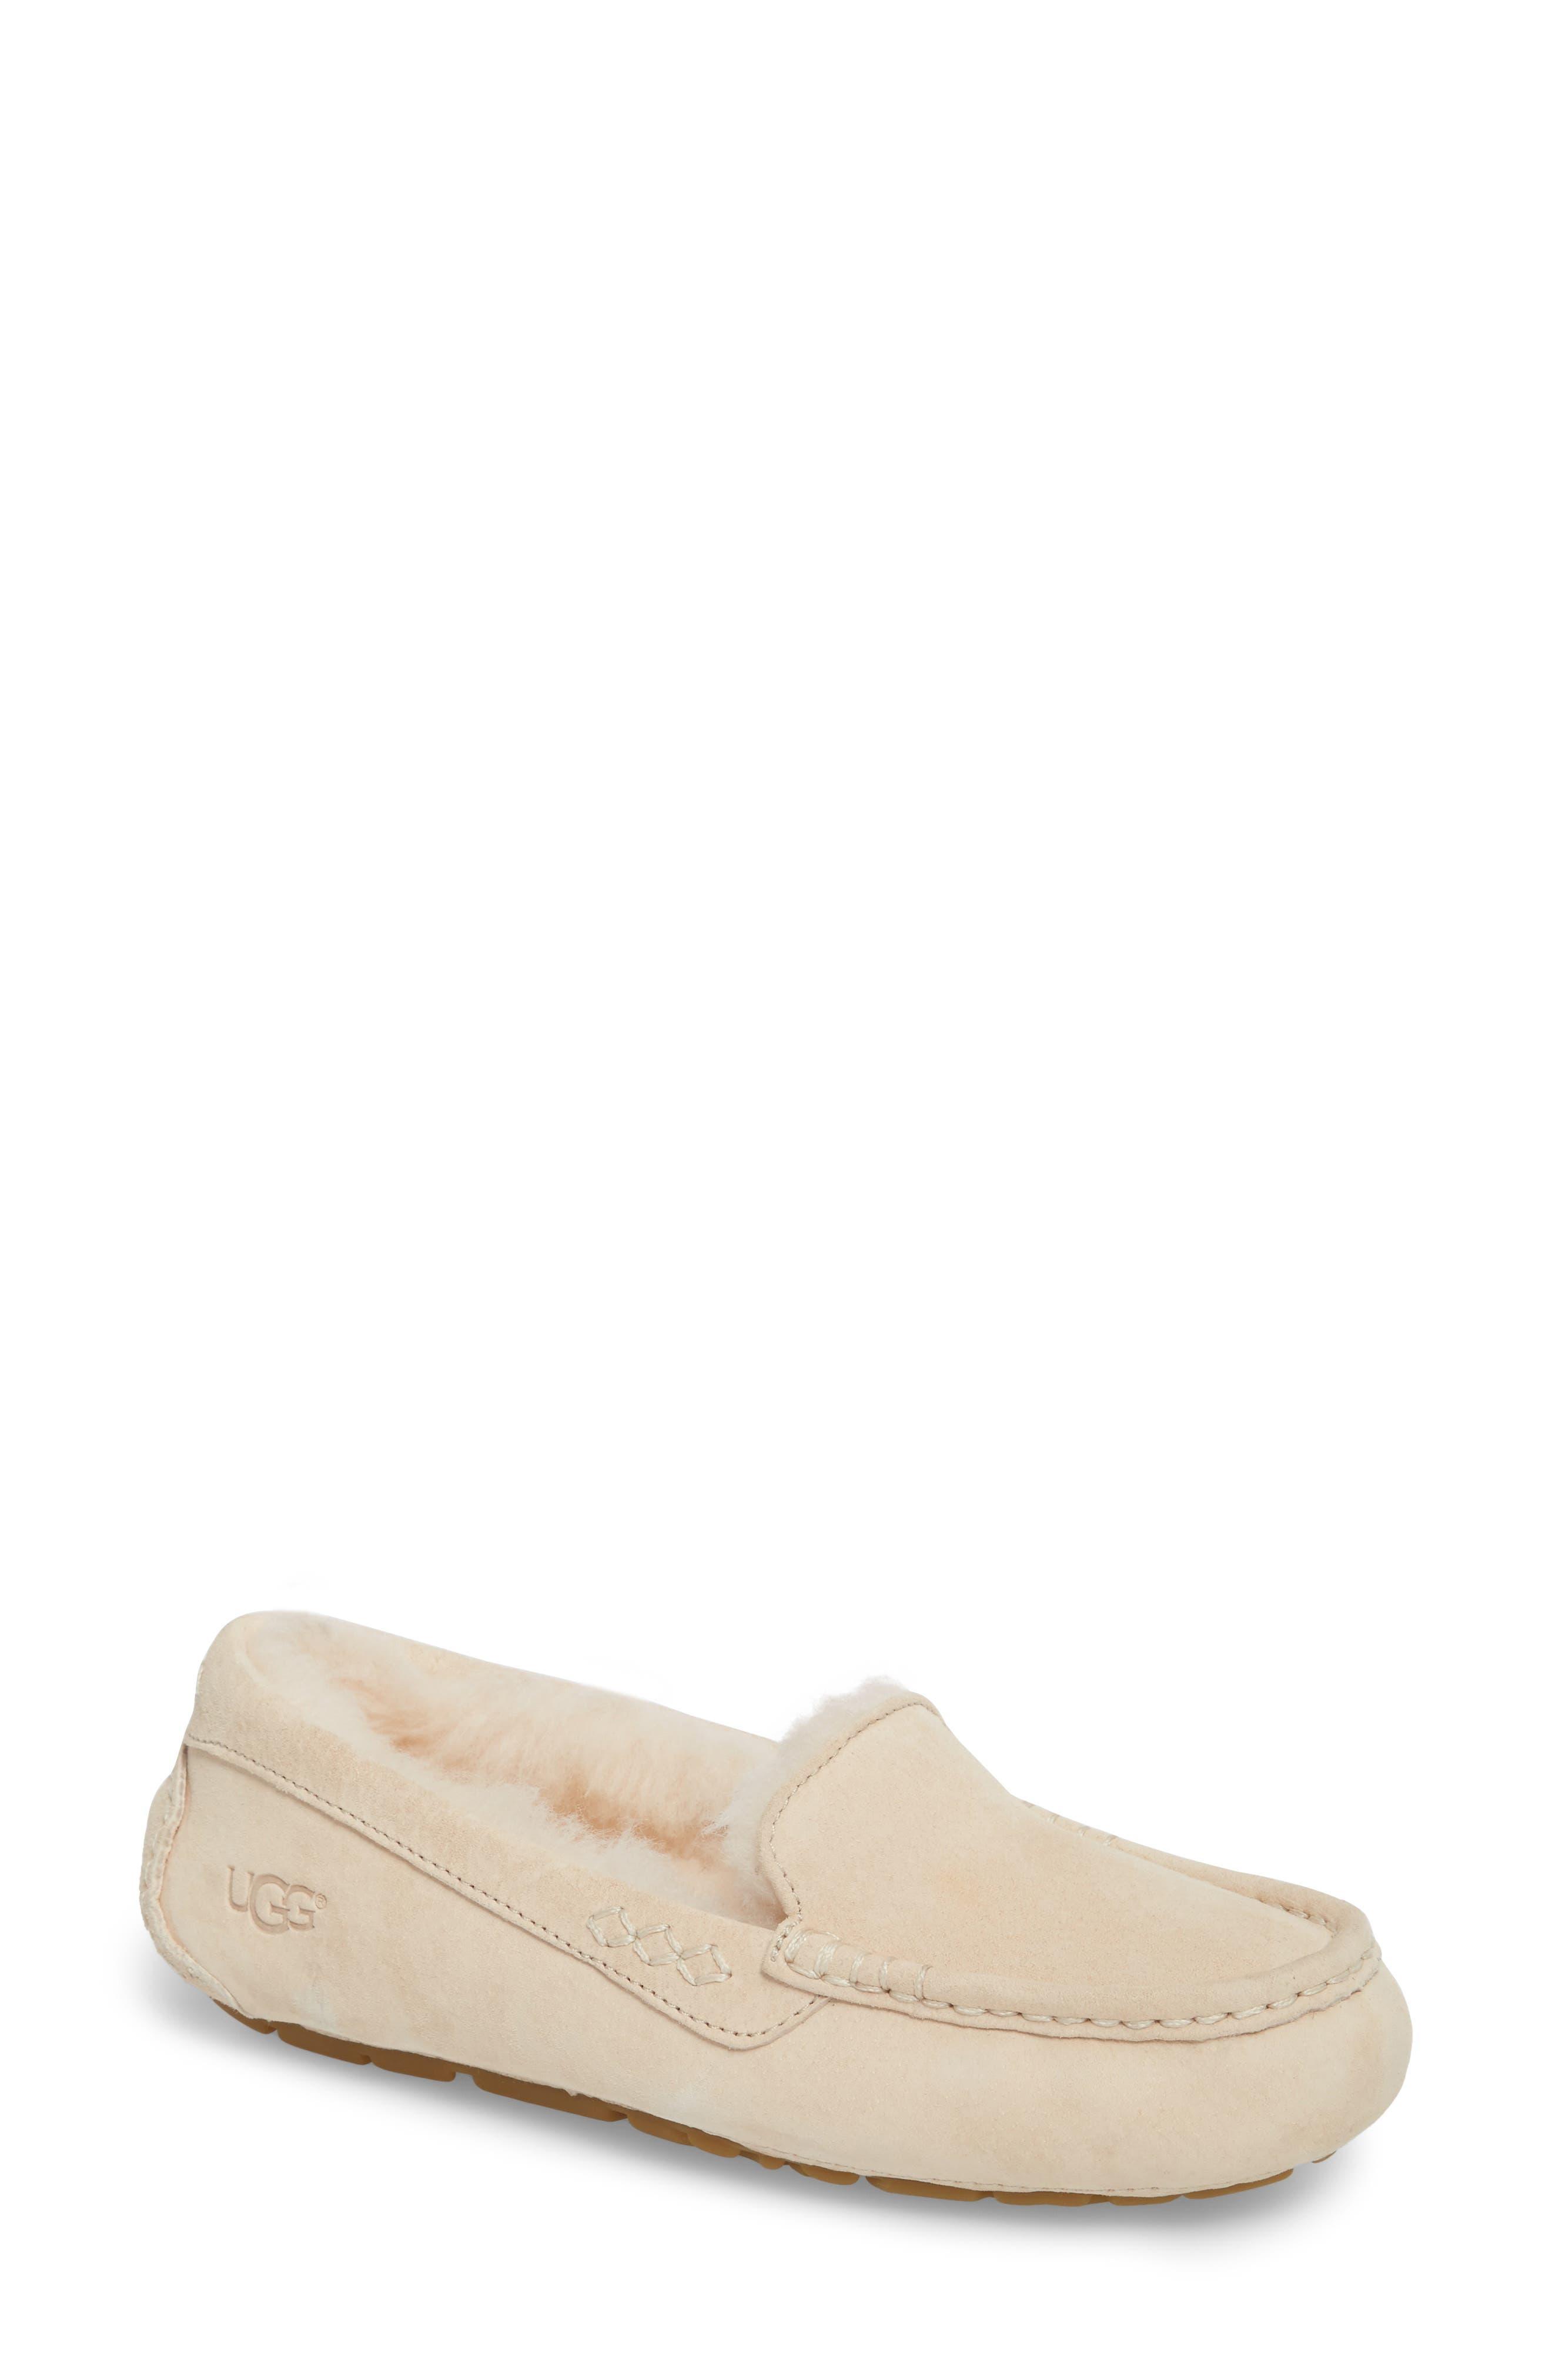 Alternate Image 1 Selected - UGG® Ansley Water Resistant Slipper (Women)